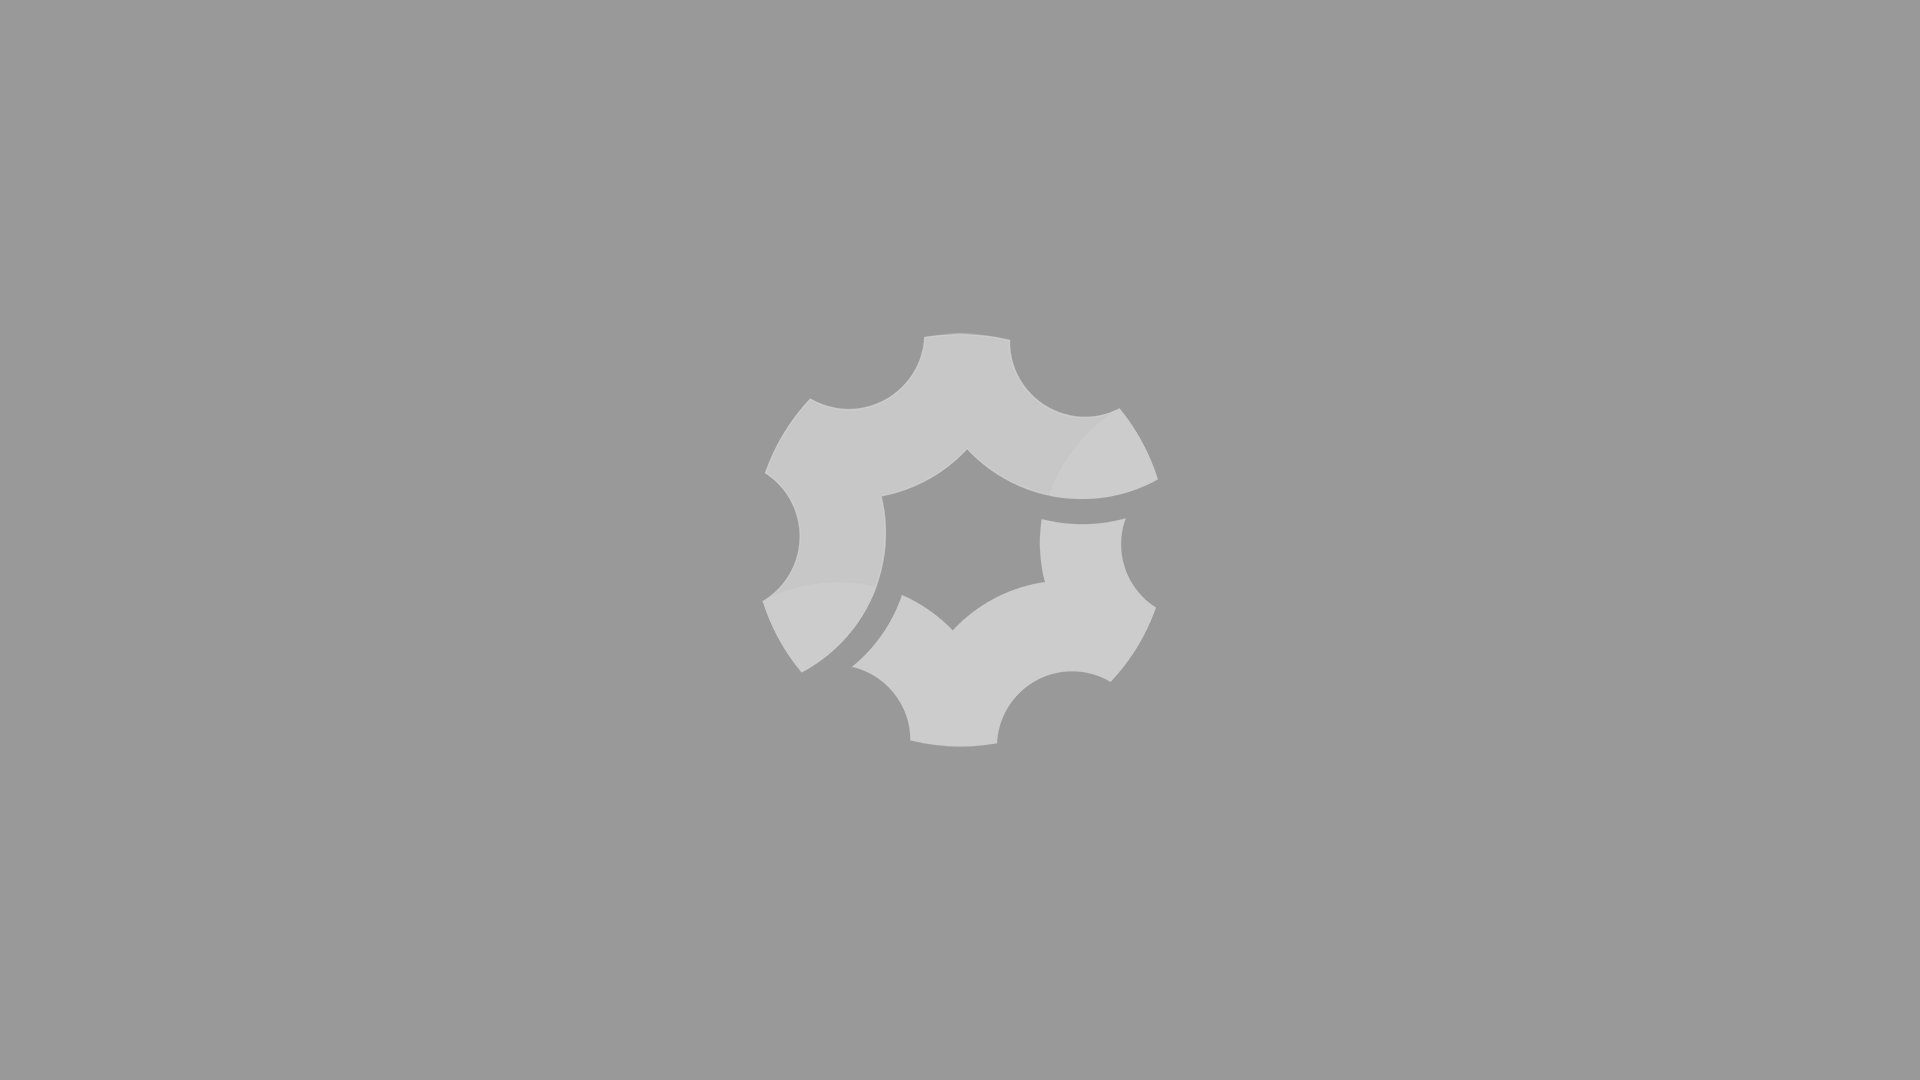 board-logo-wood-xl.png